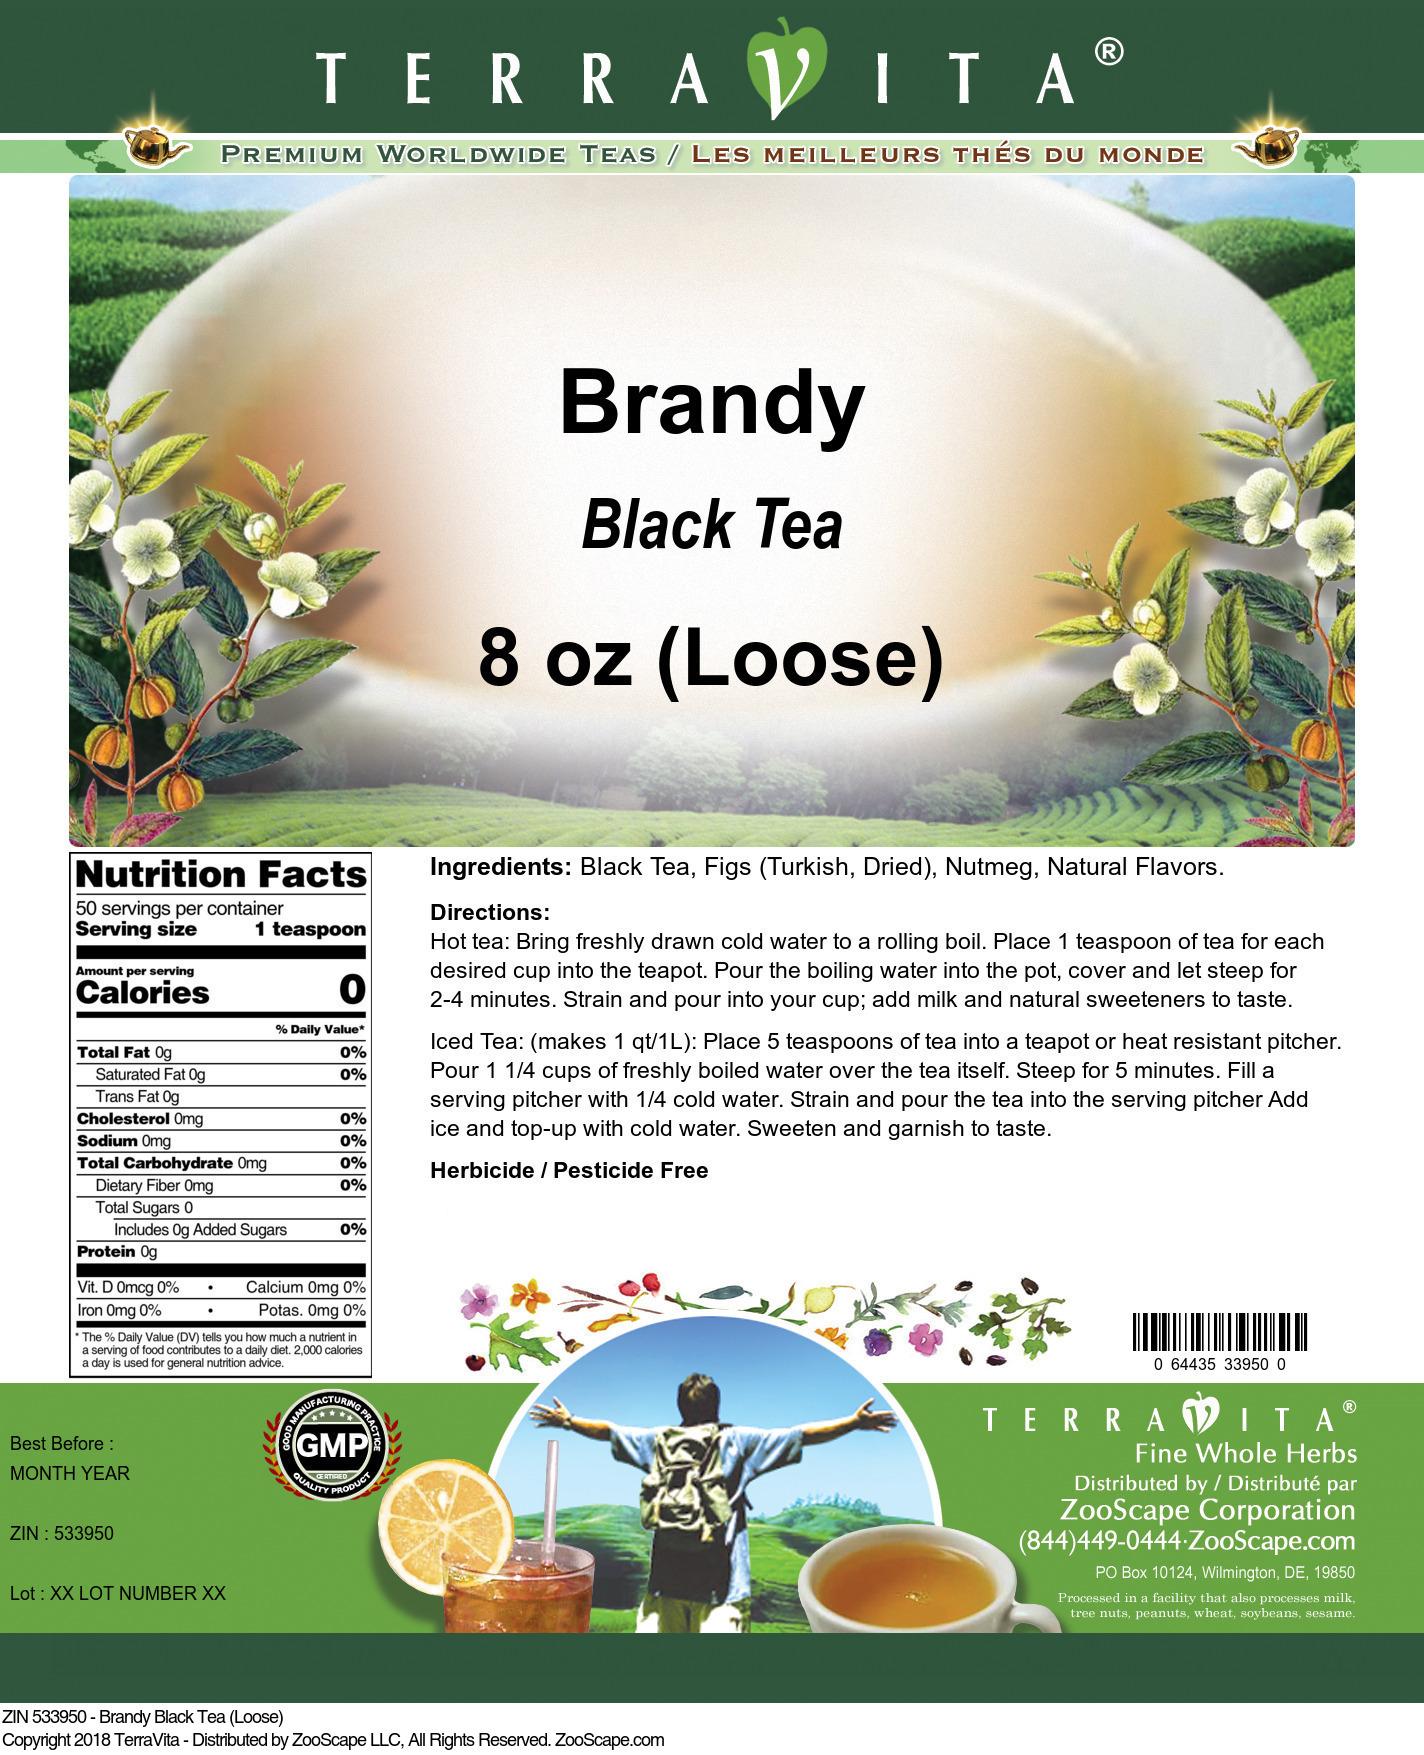 Brandy Black Tea